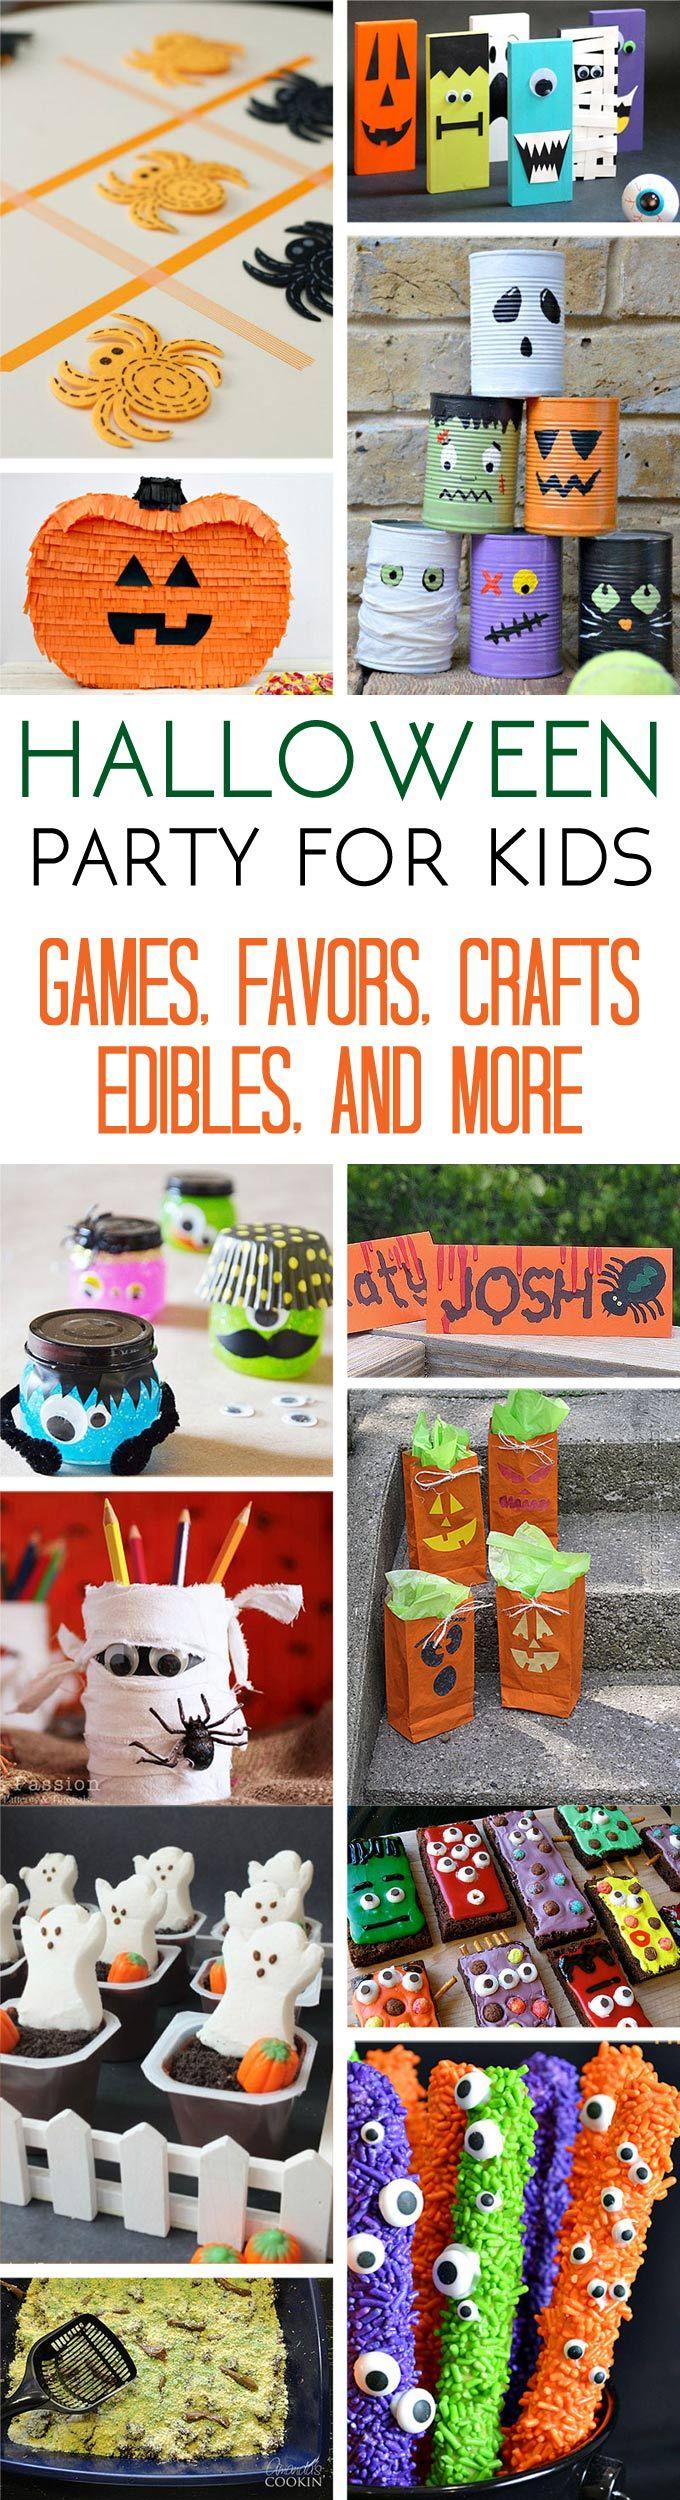 37 Halloween Party Ideas: Crafts, DIY Favors, Games & Treats ...